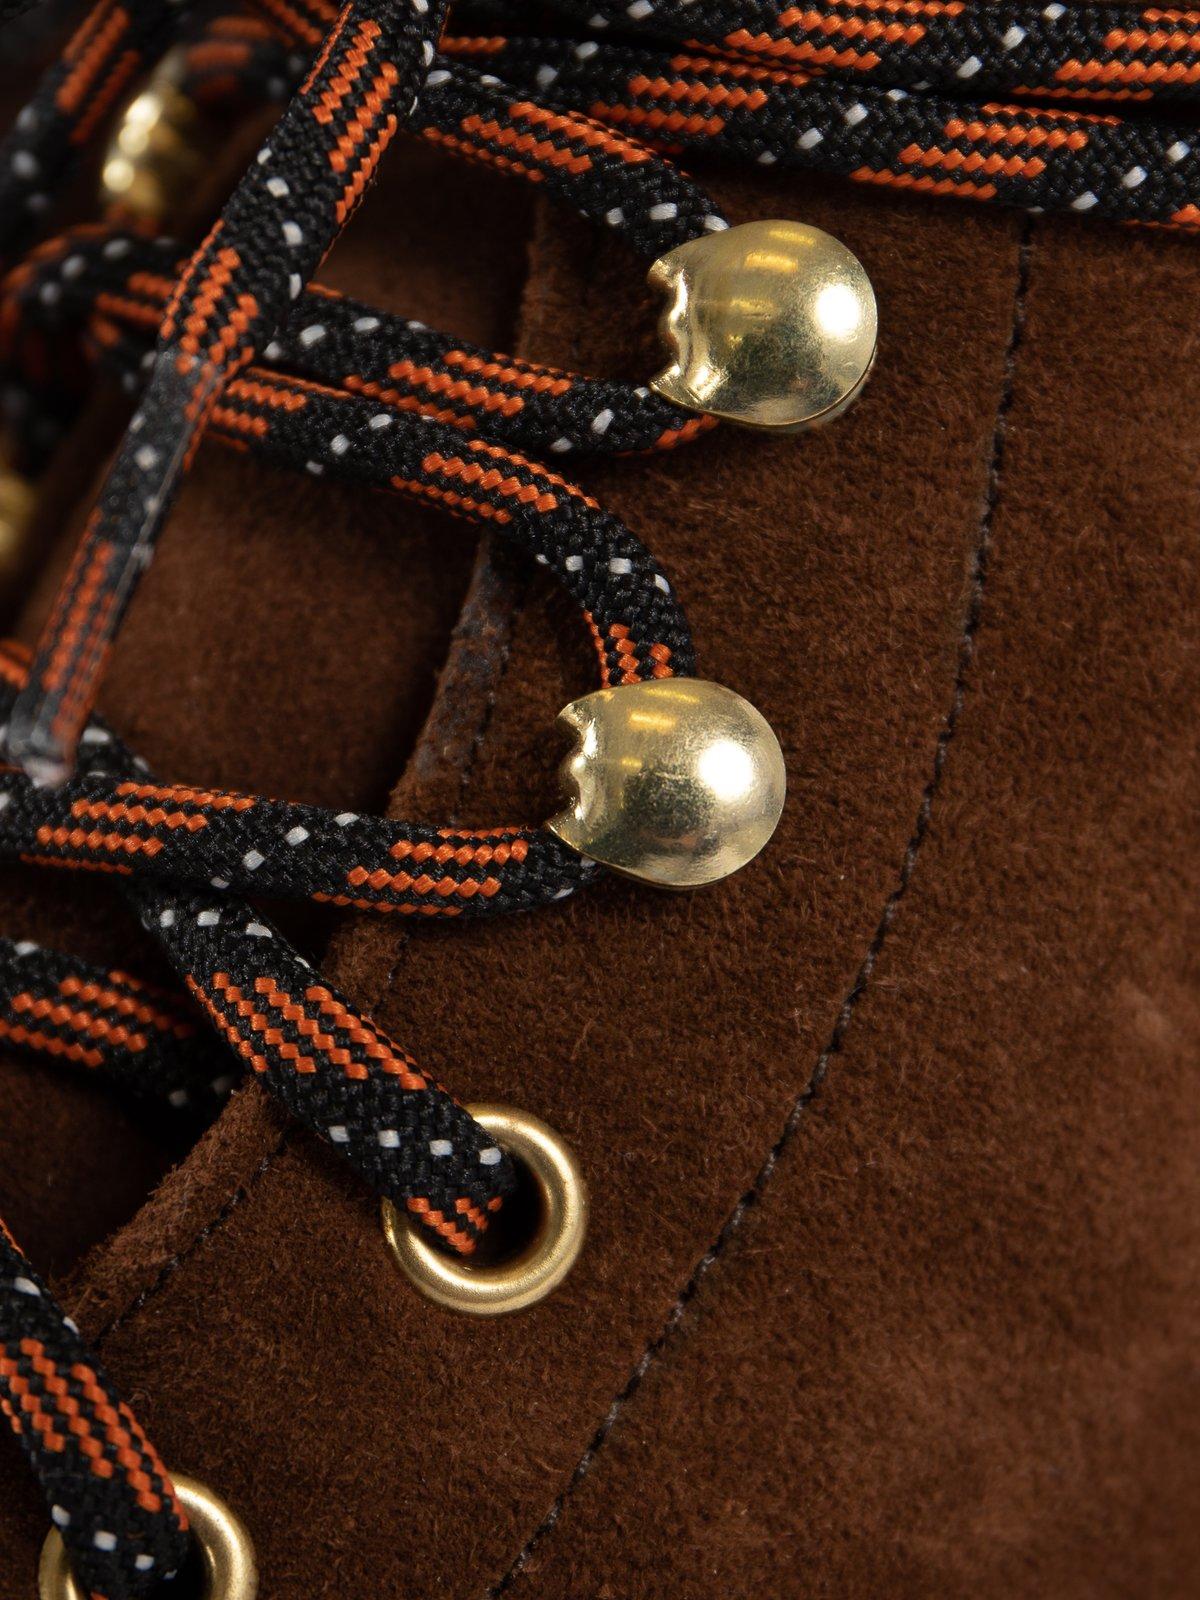 Ridge Reverse Kudu Grasmere Super Boot - Image 11